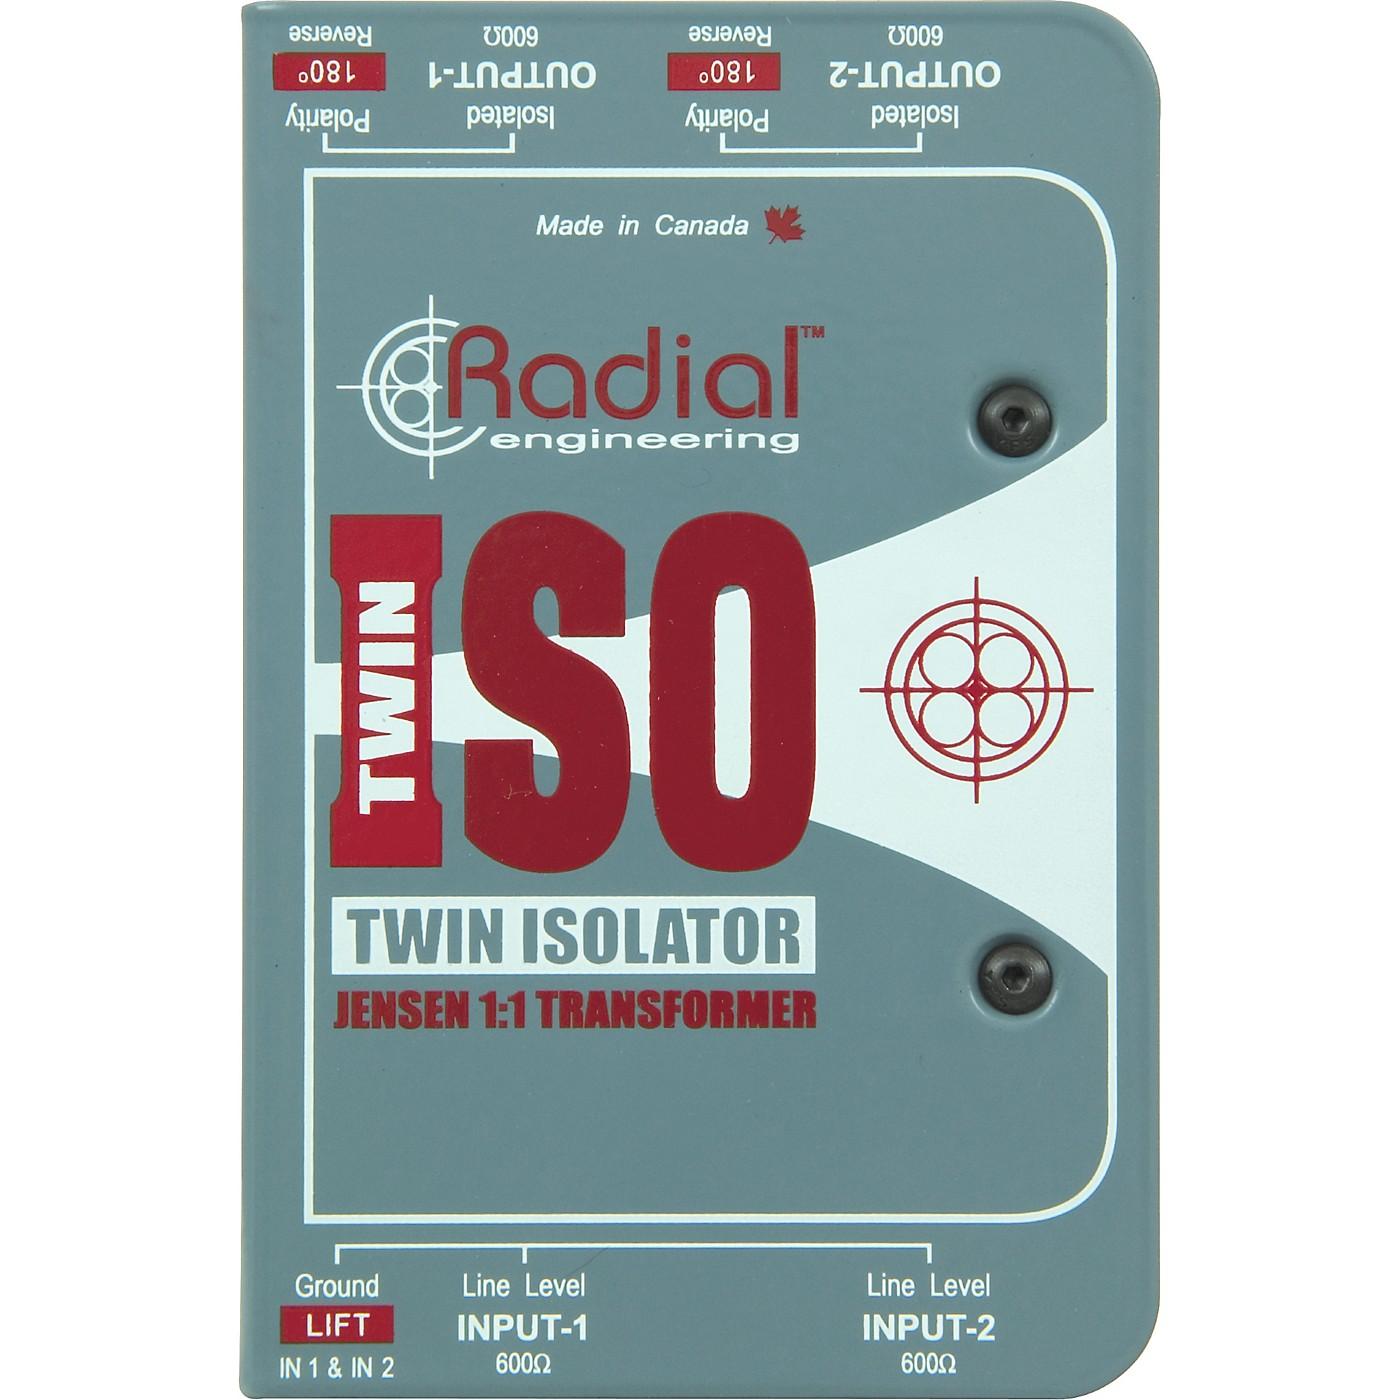 Radial Engineering TWIN ISO Passive Line-Level Isolator thumbnail